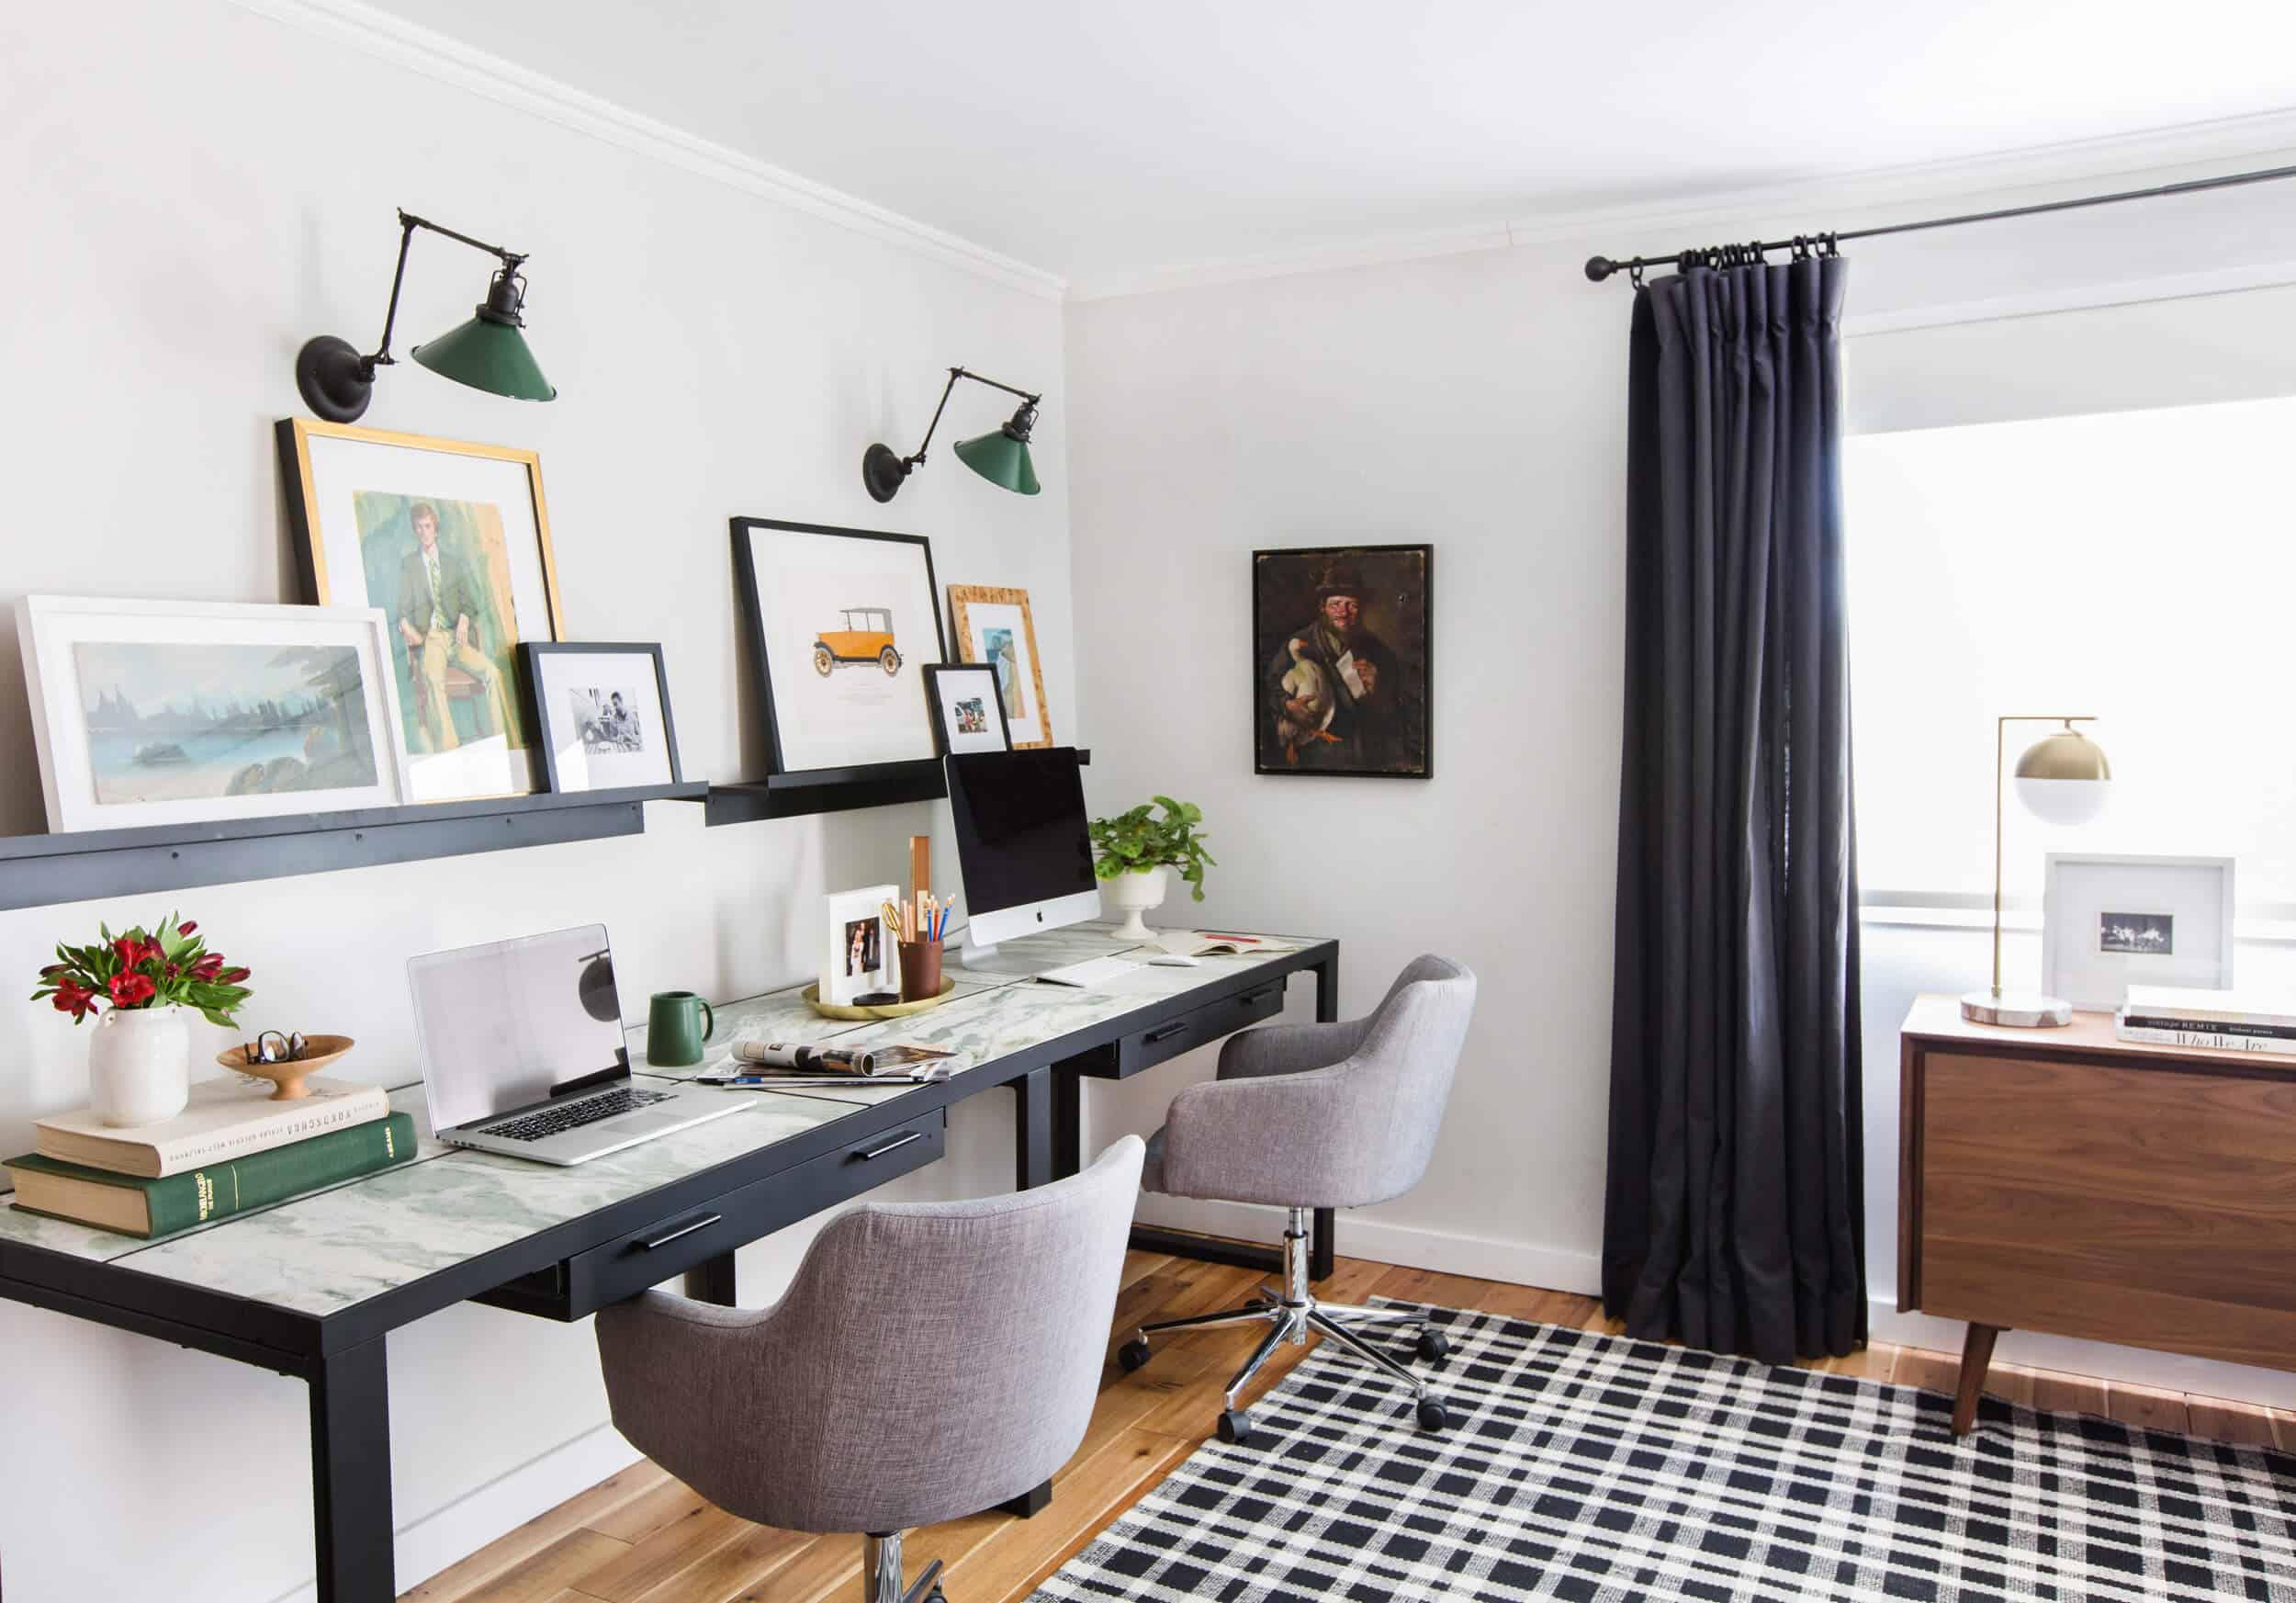 emily-henderson_framebridge_art-ledge_brians-office_masculine-office_guy_green_plaid-rug_workspace_modern_eclectic_13